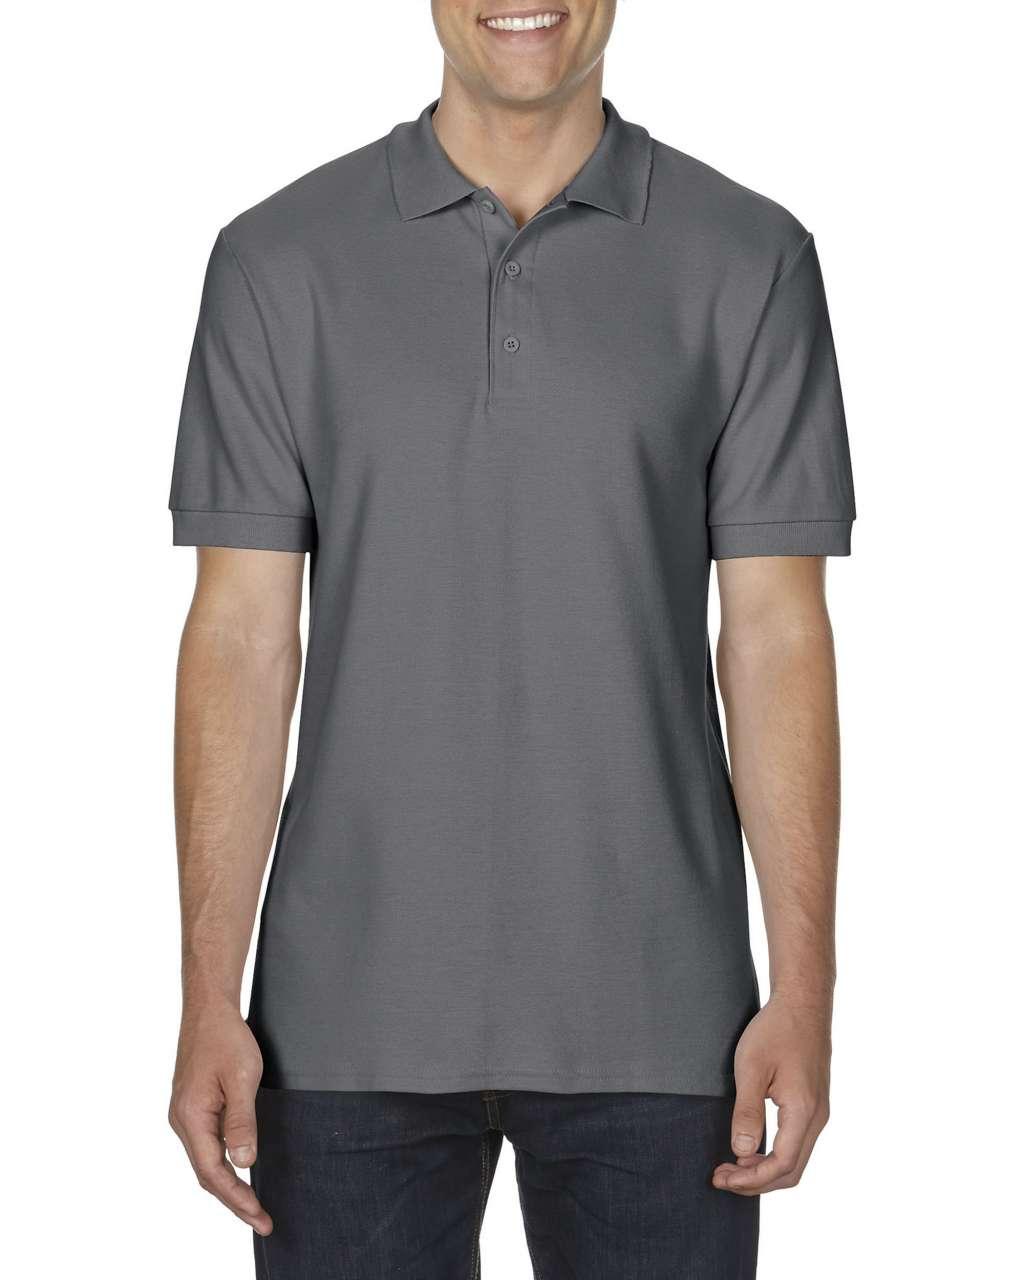 Tricou polo barbatesc Gildan Premium Cotton bumbac 223 g/mp serigrafie broderie termotransfer | Toroadv.ro